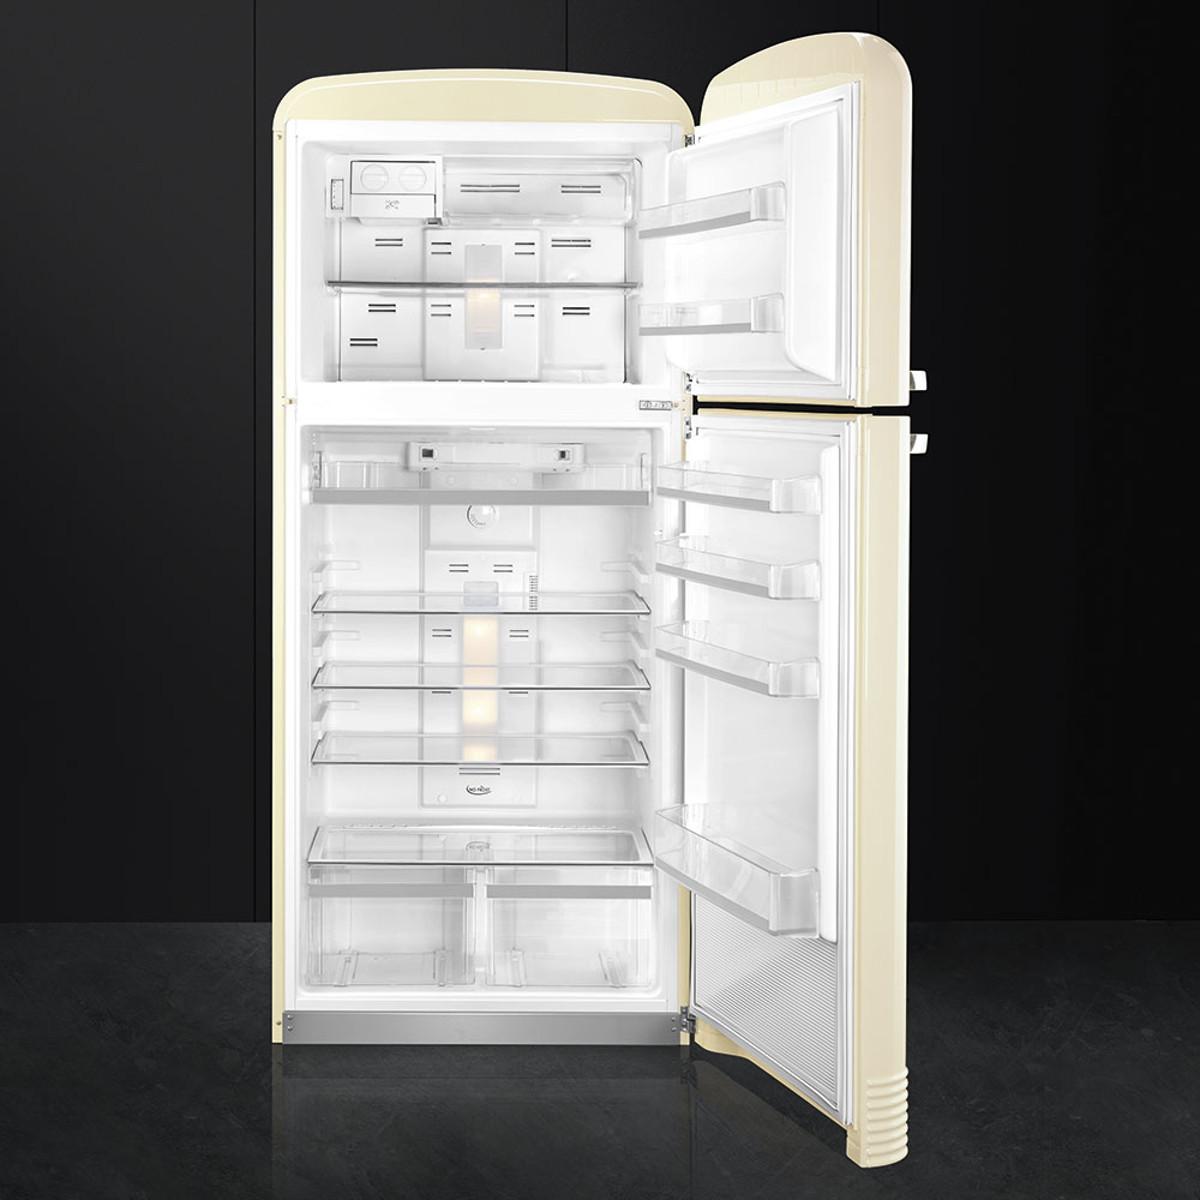 Smeg Fab50rcr Retro Style Fridge Freezer In Cream Rh Hinge Open View